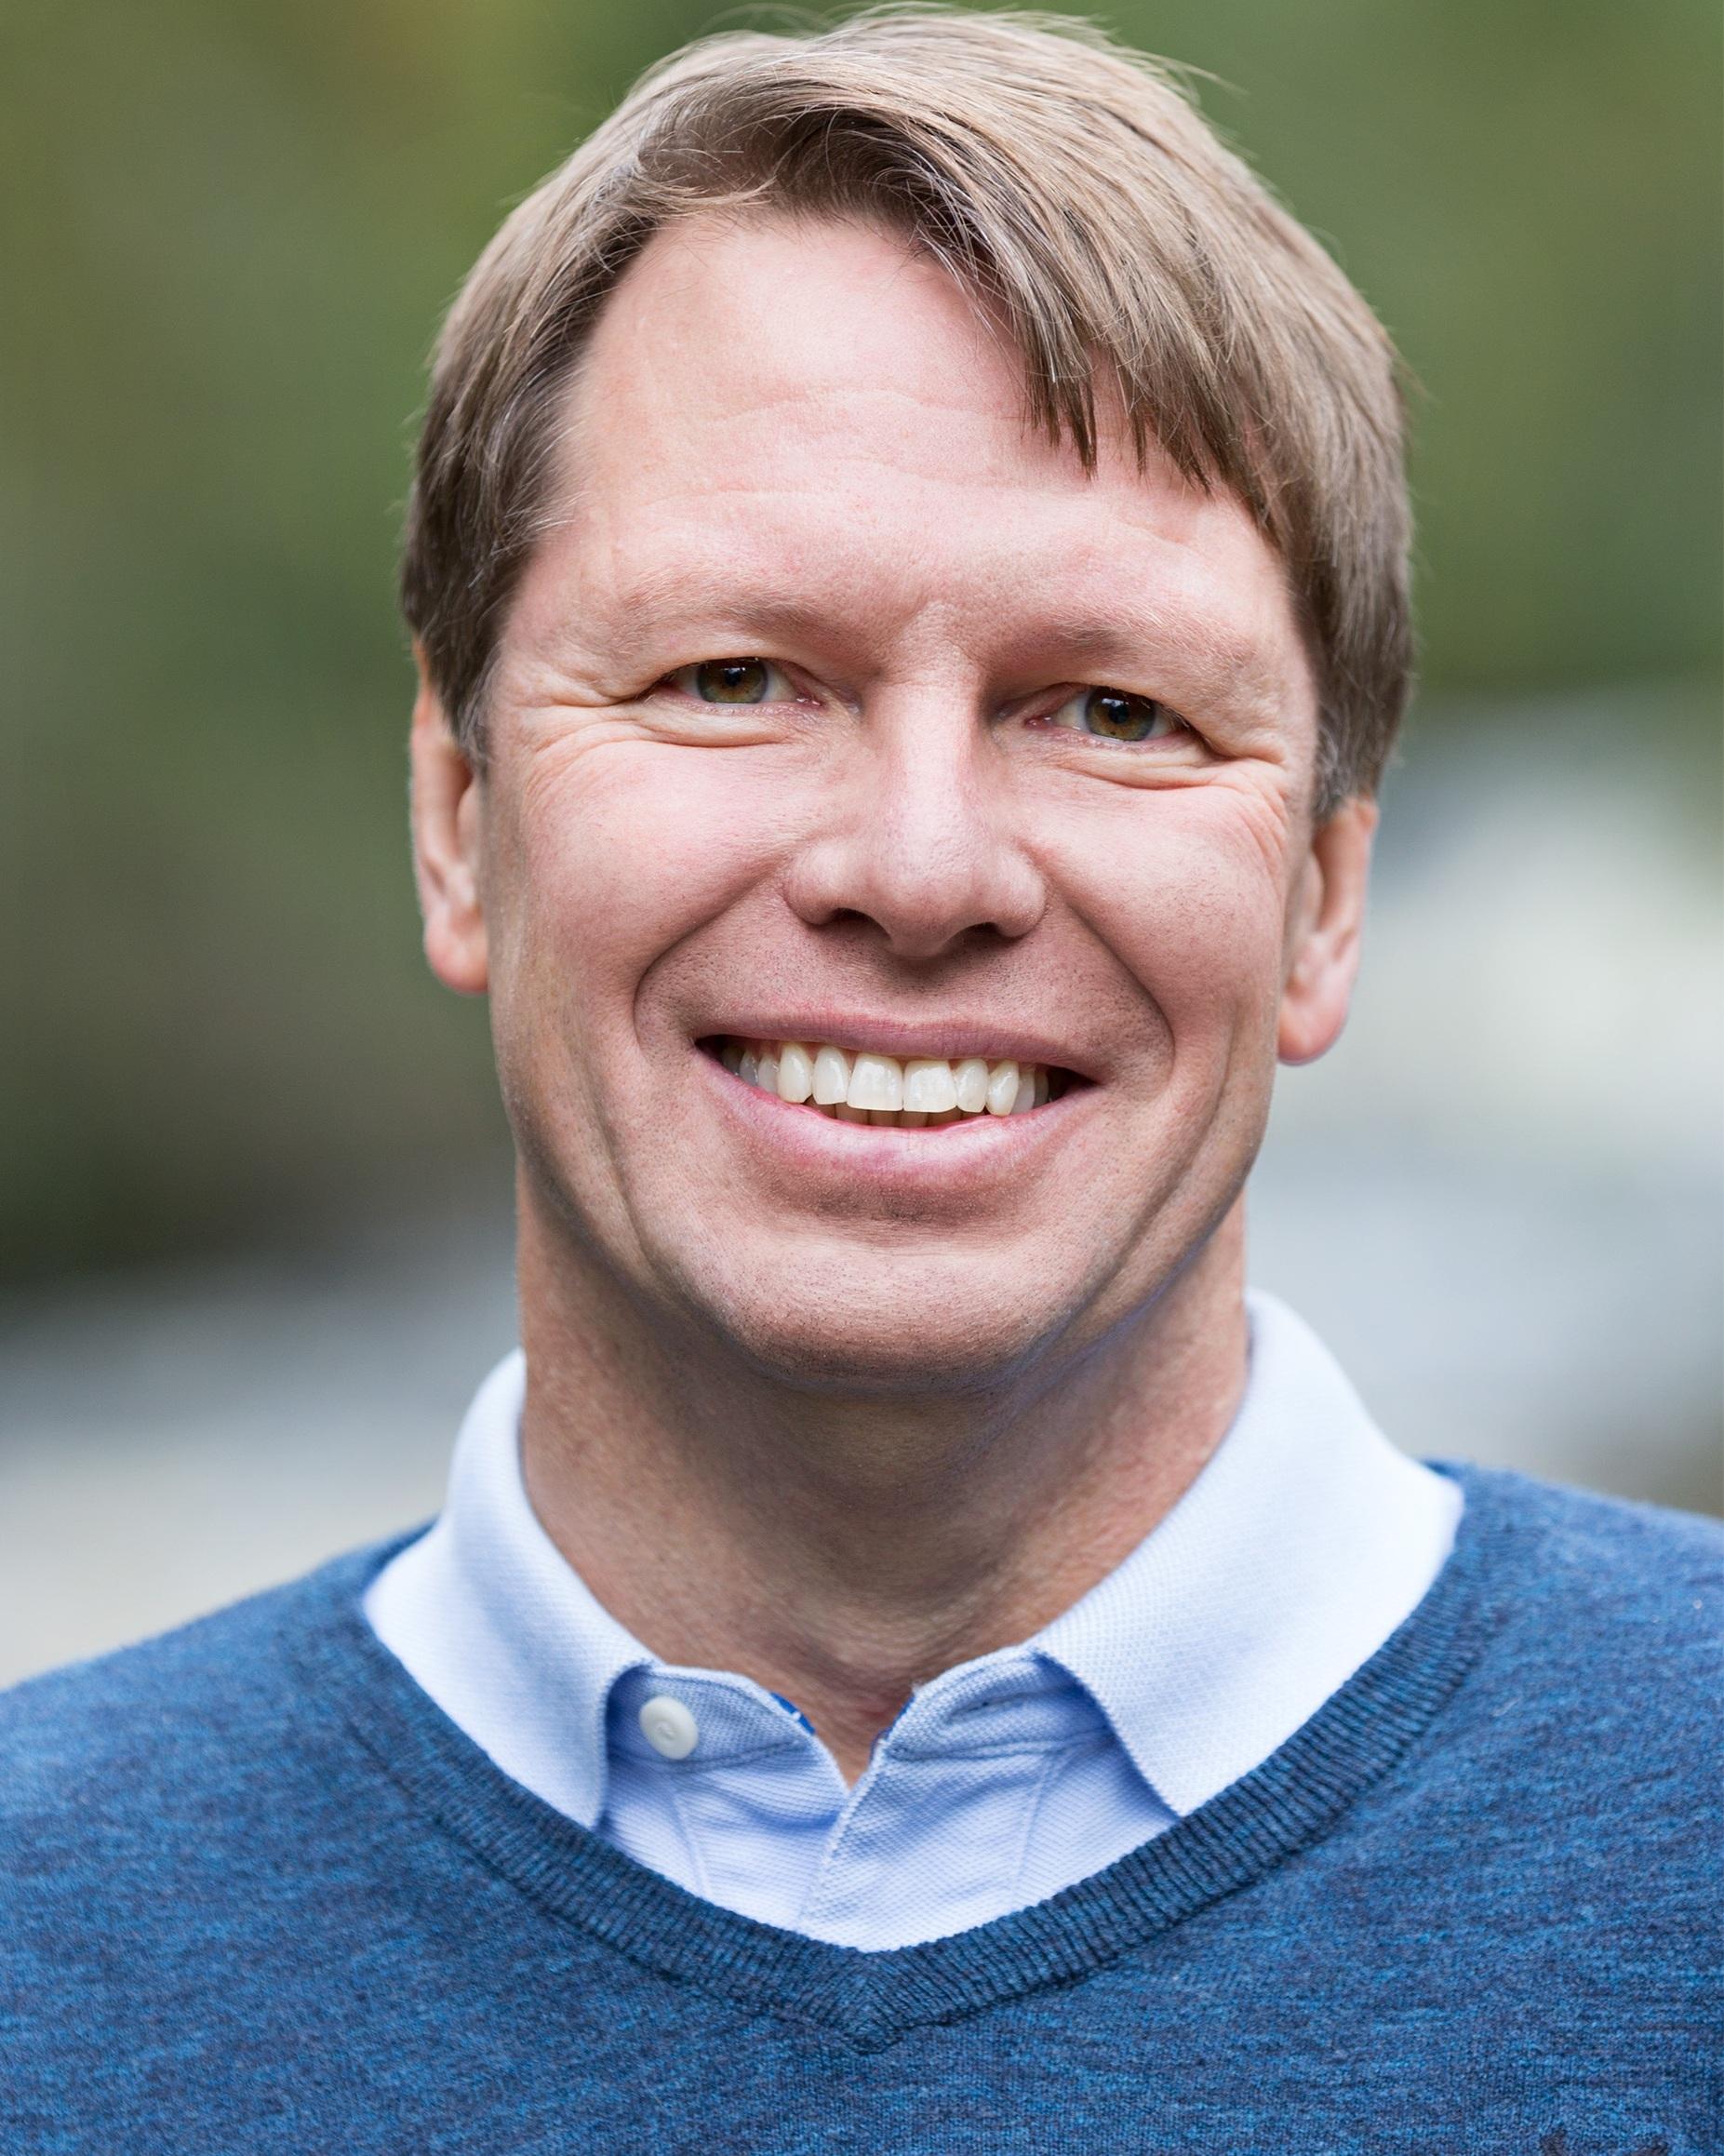 Leif Håvar Kvande - E-post: leif@nard.noTelefon: 452 02 414